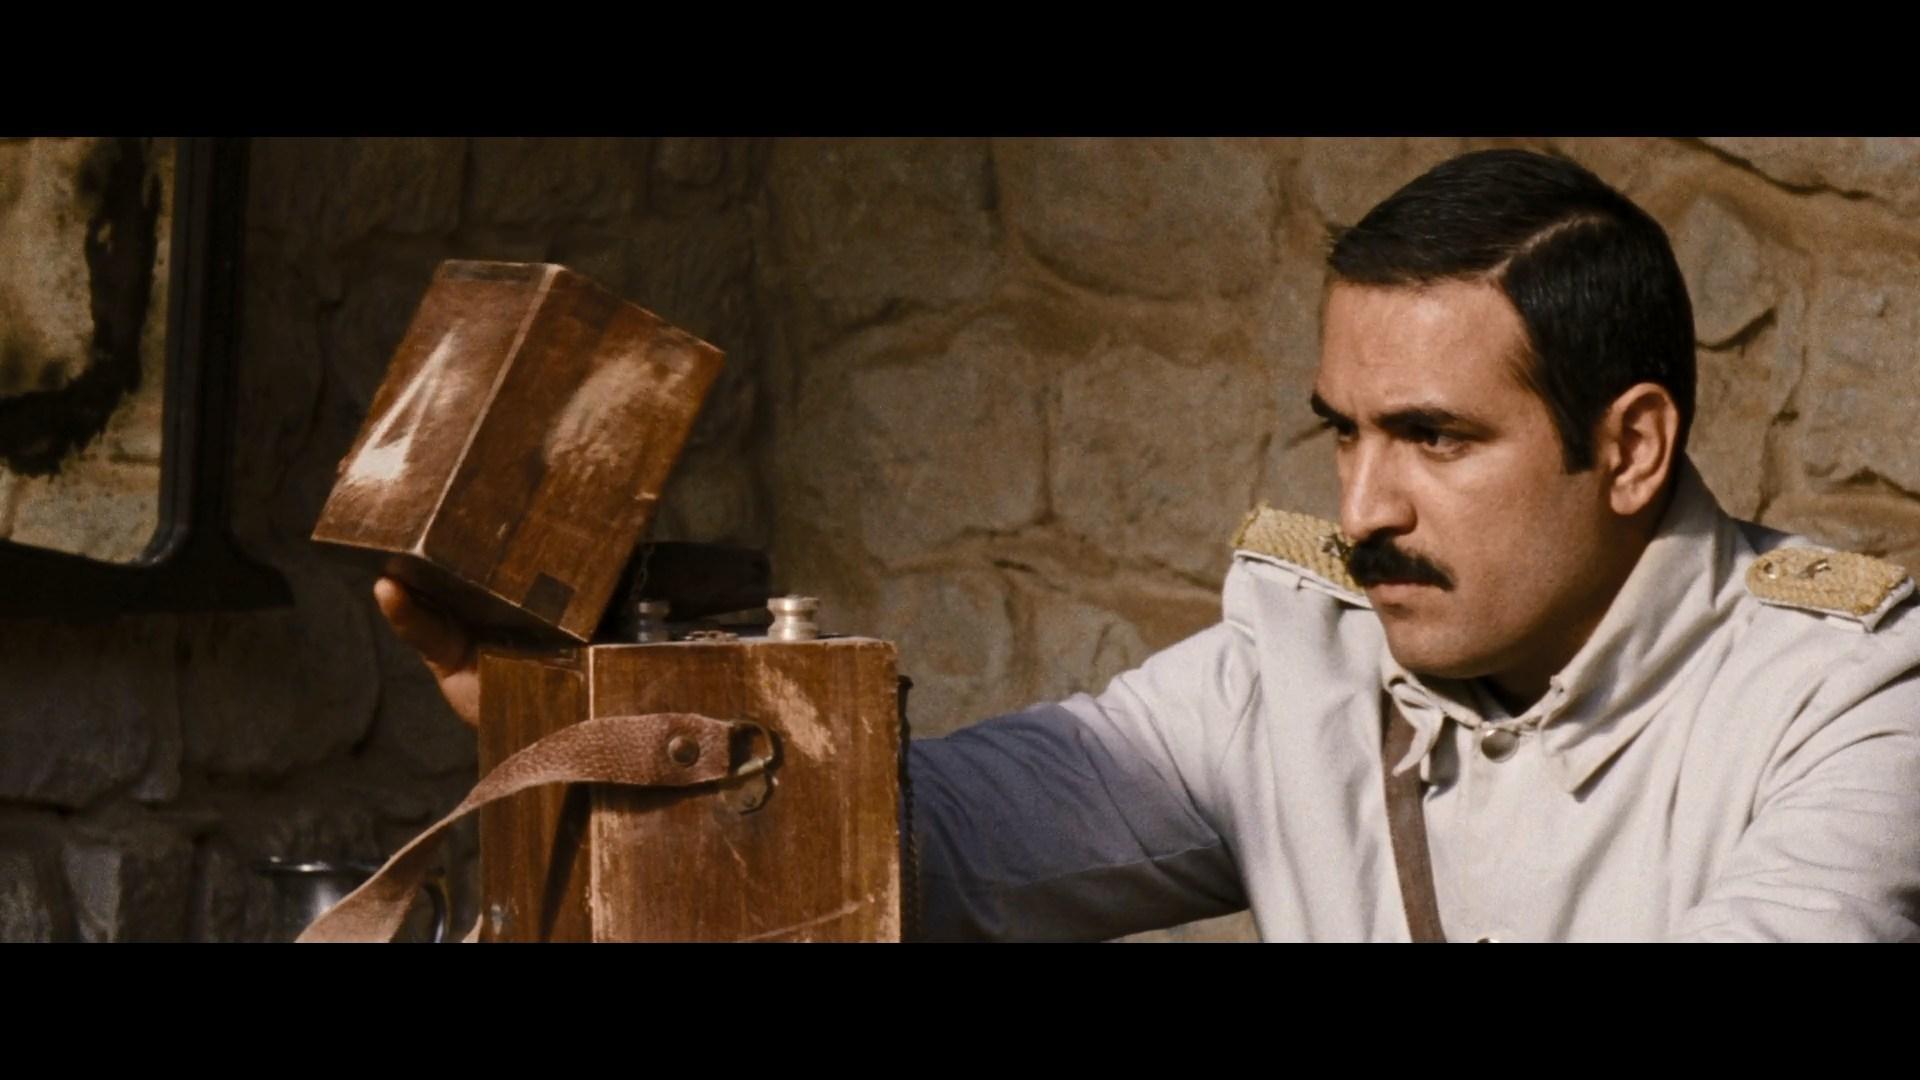 [فيلم][تورنت][تحميل][ذيب][2014][1080p][Web-DL] 8 arabp2p.com